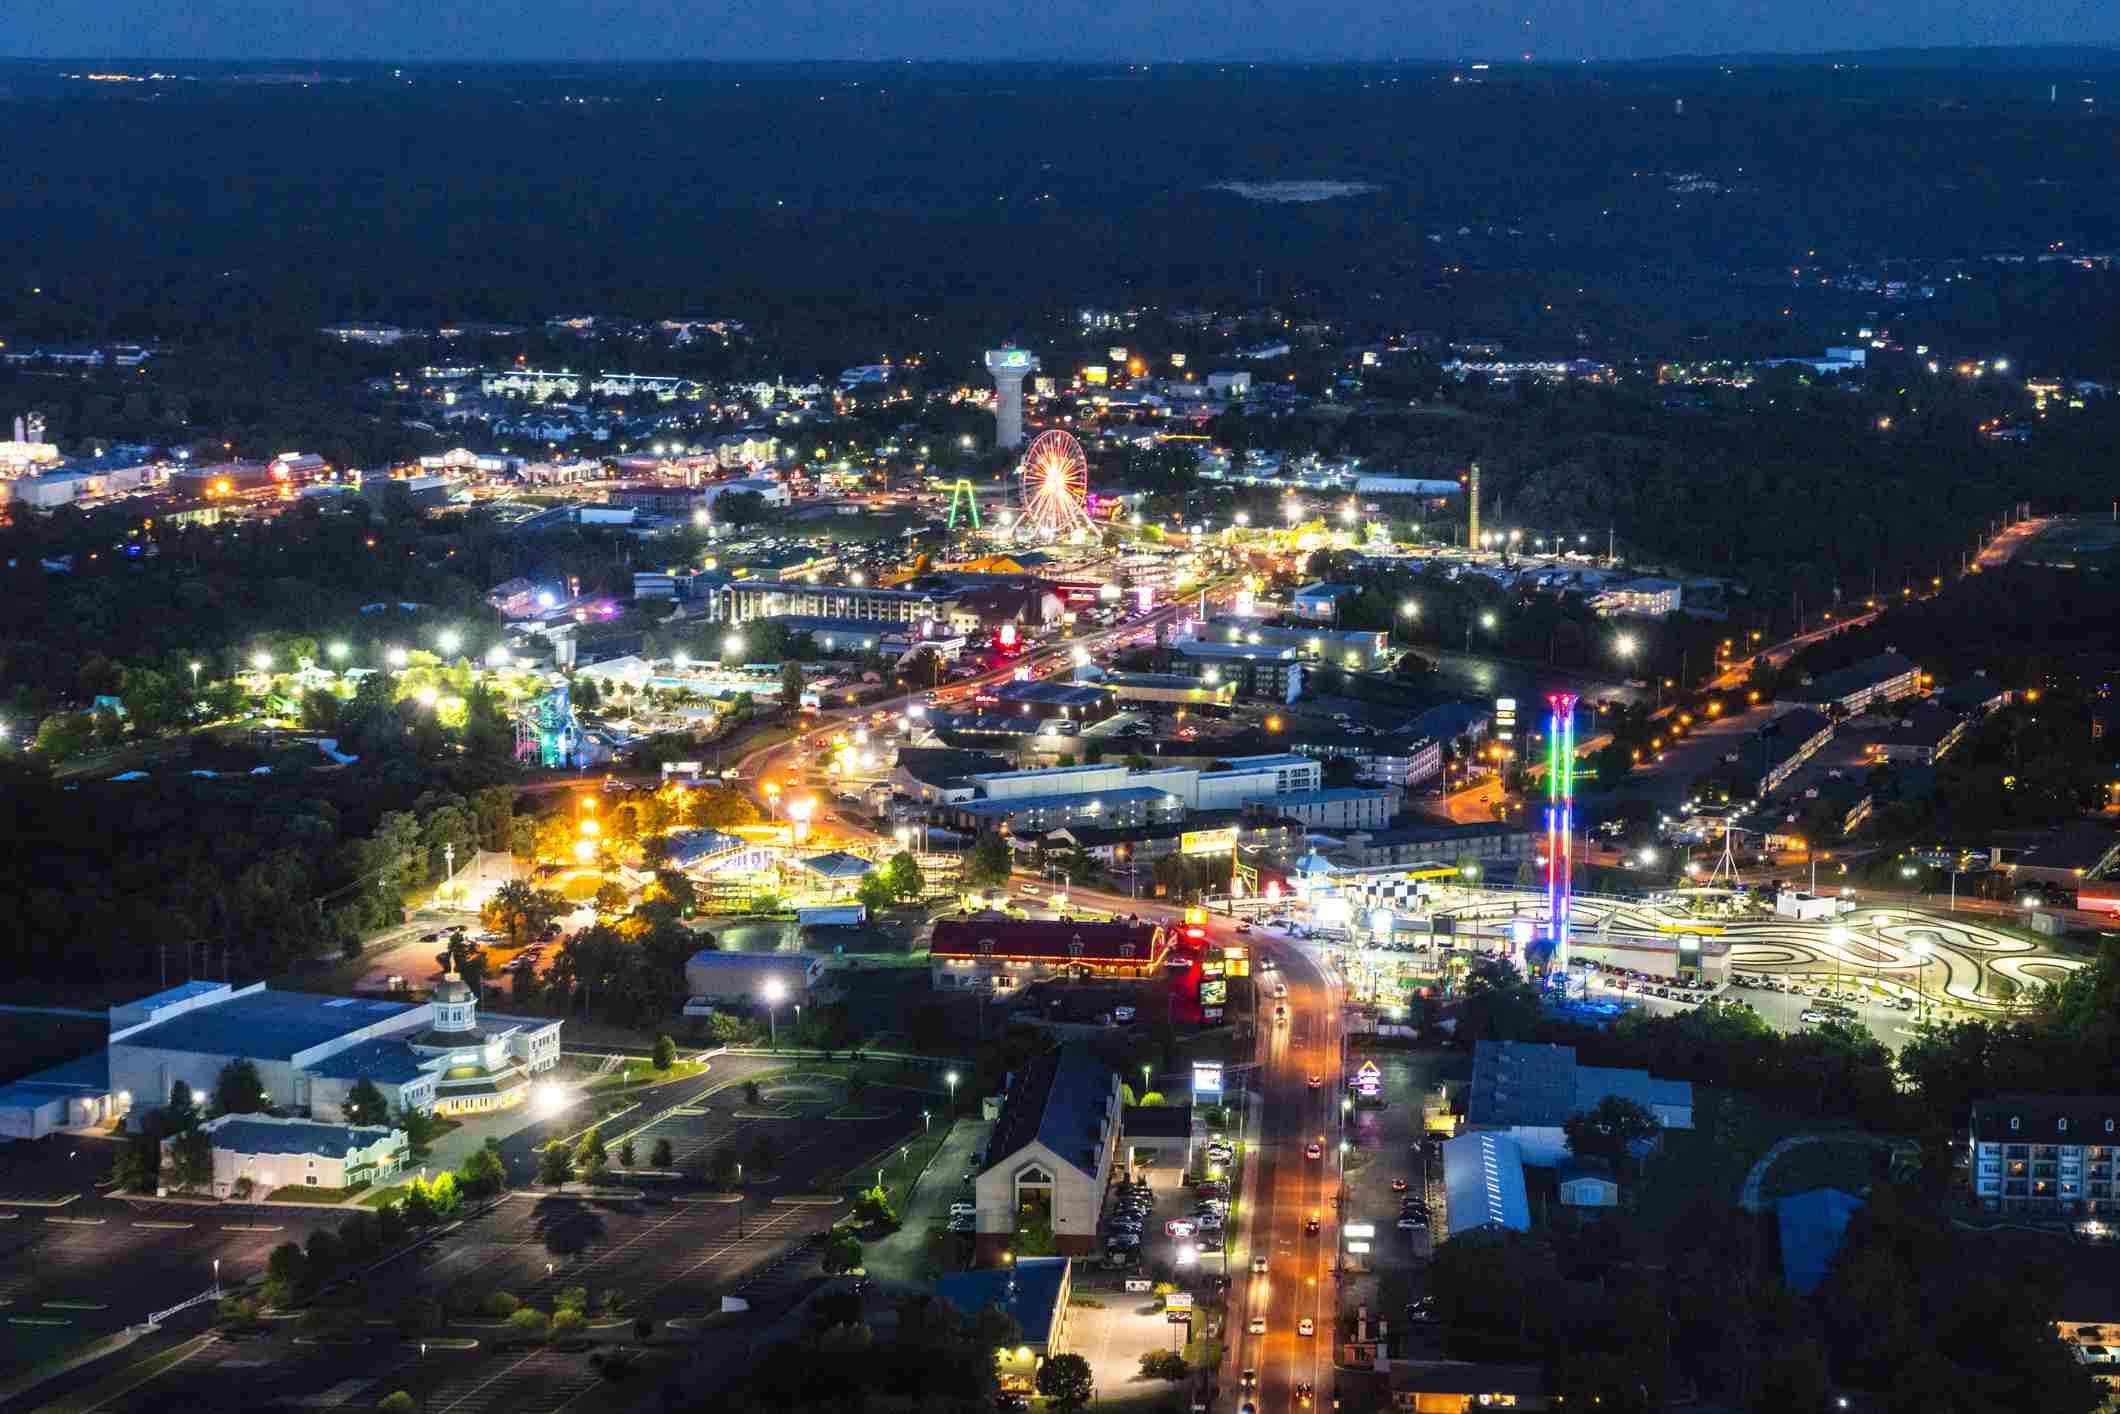 Nighttime Aerial View of Hwy 76, Branson Missouri